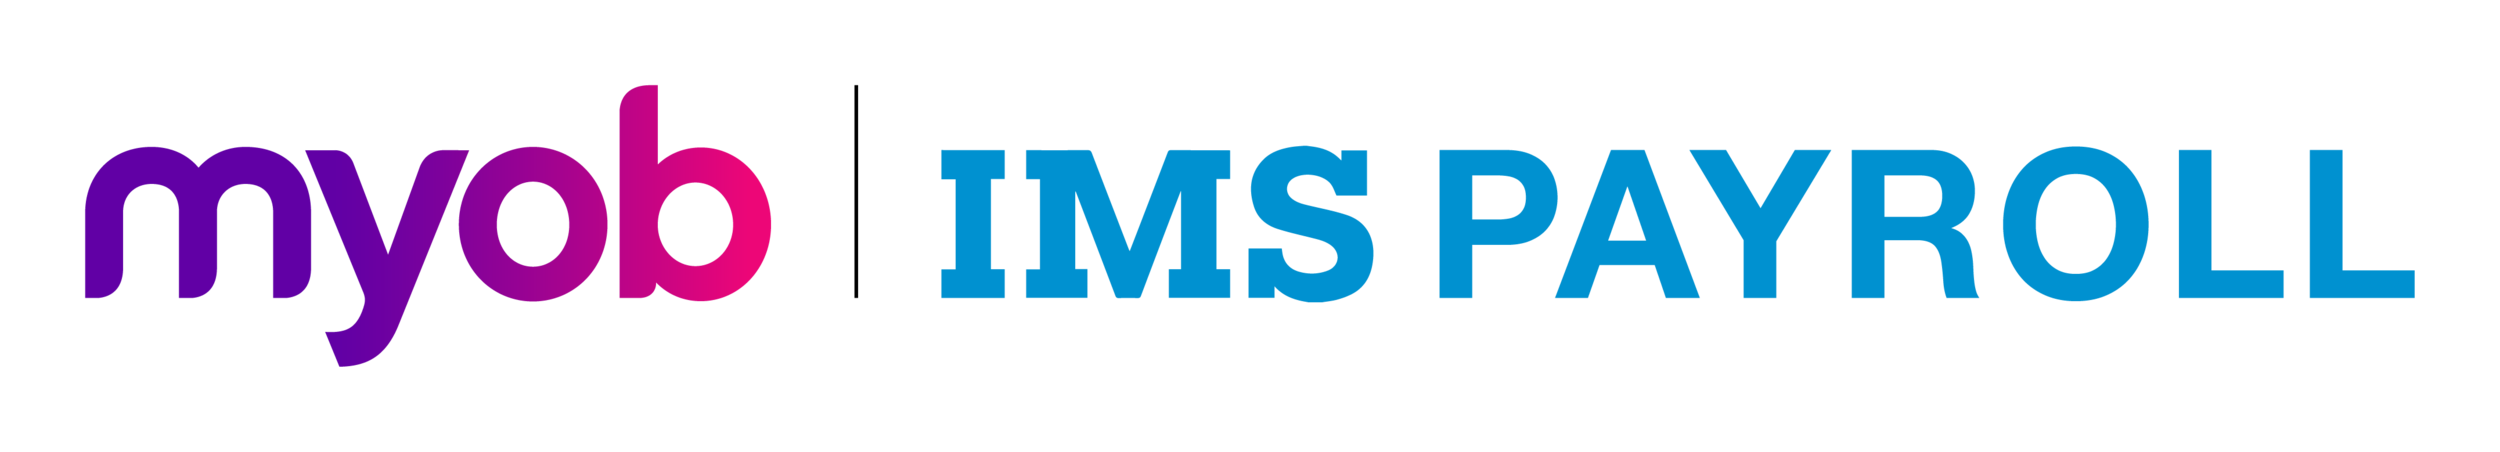 MYOB_IMSPayroll_logo_RGB.png